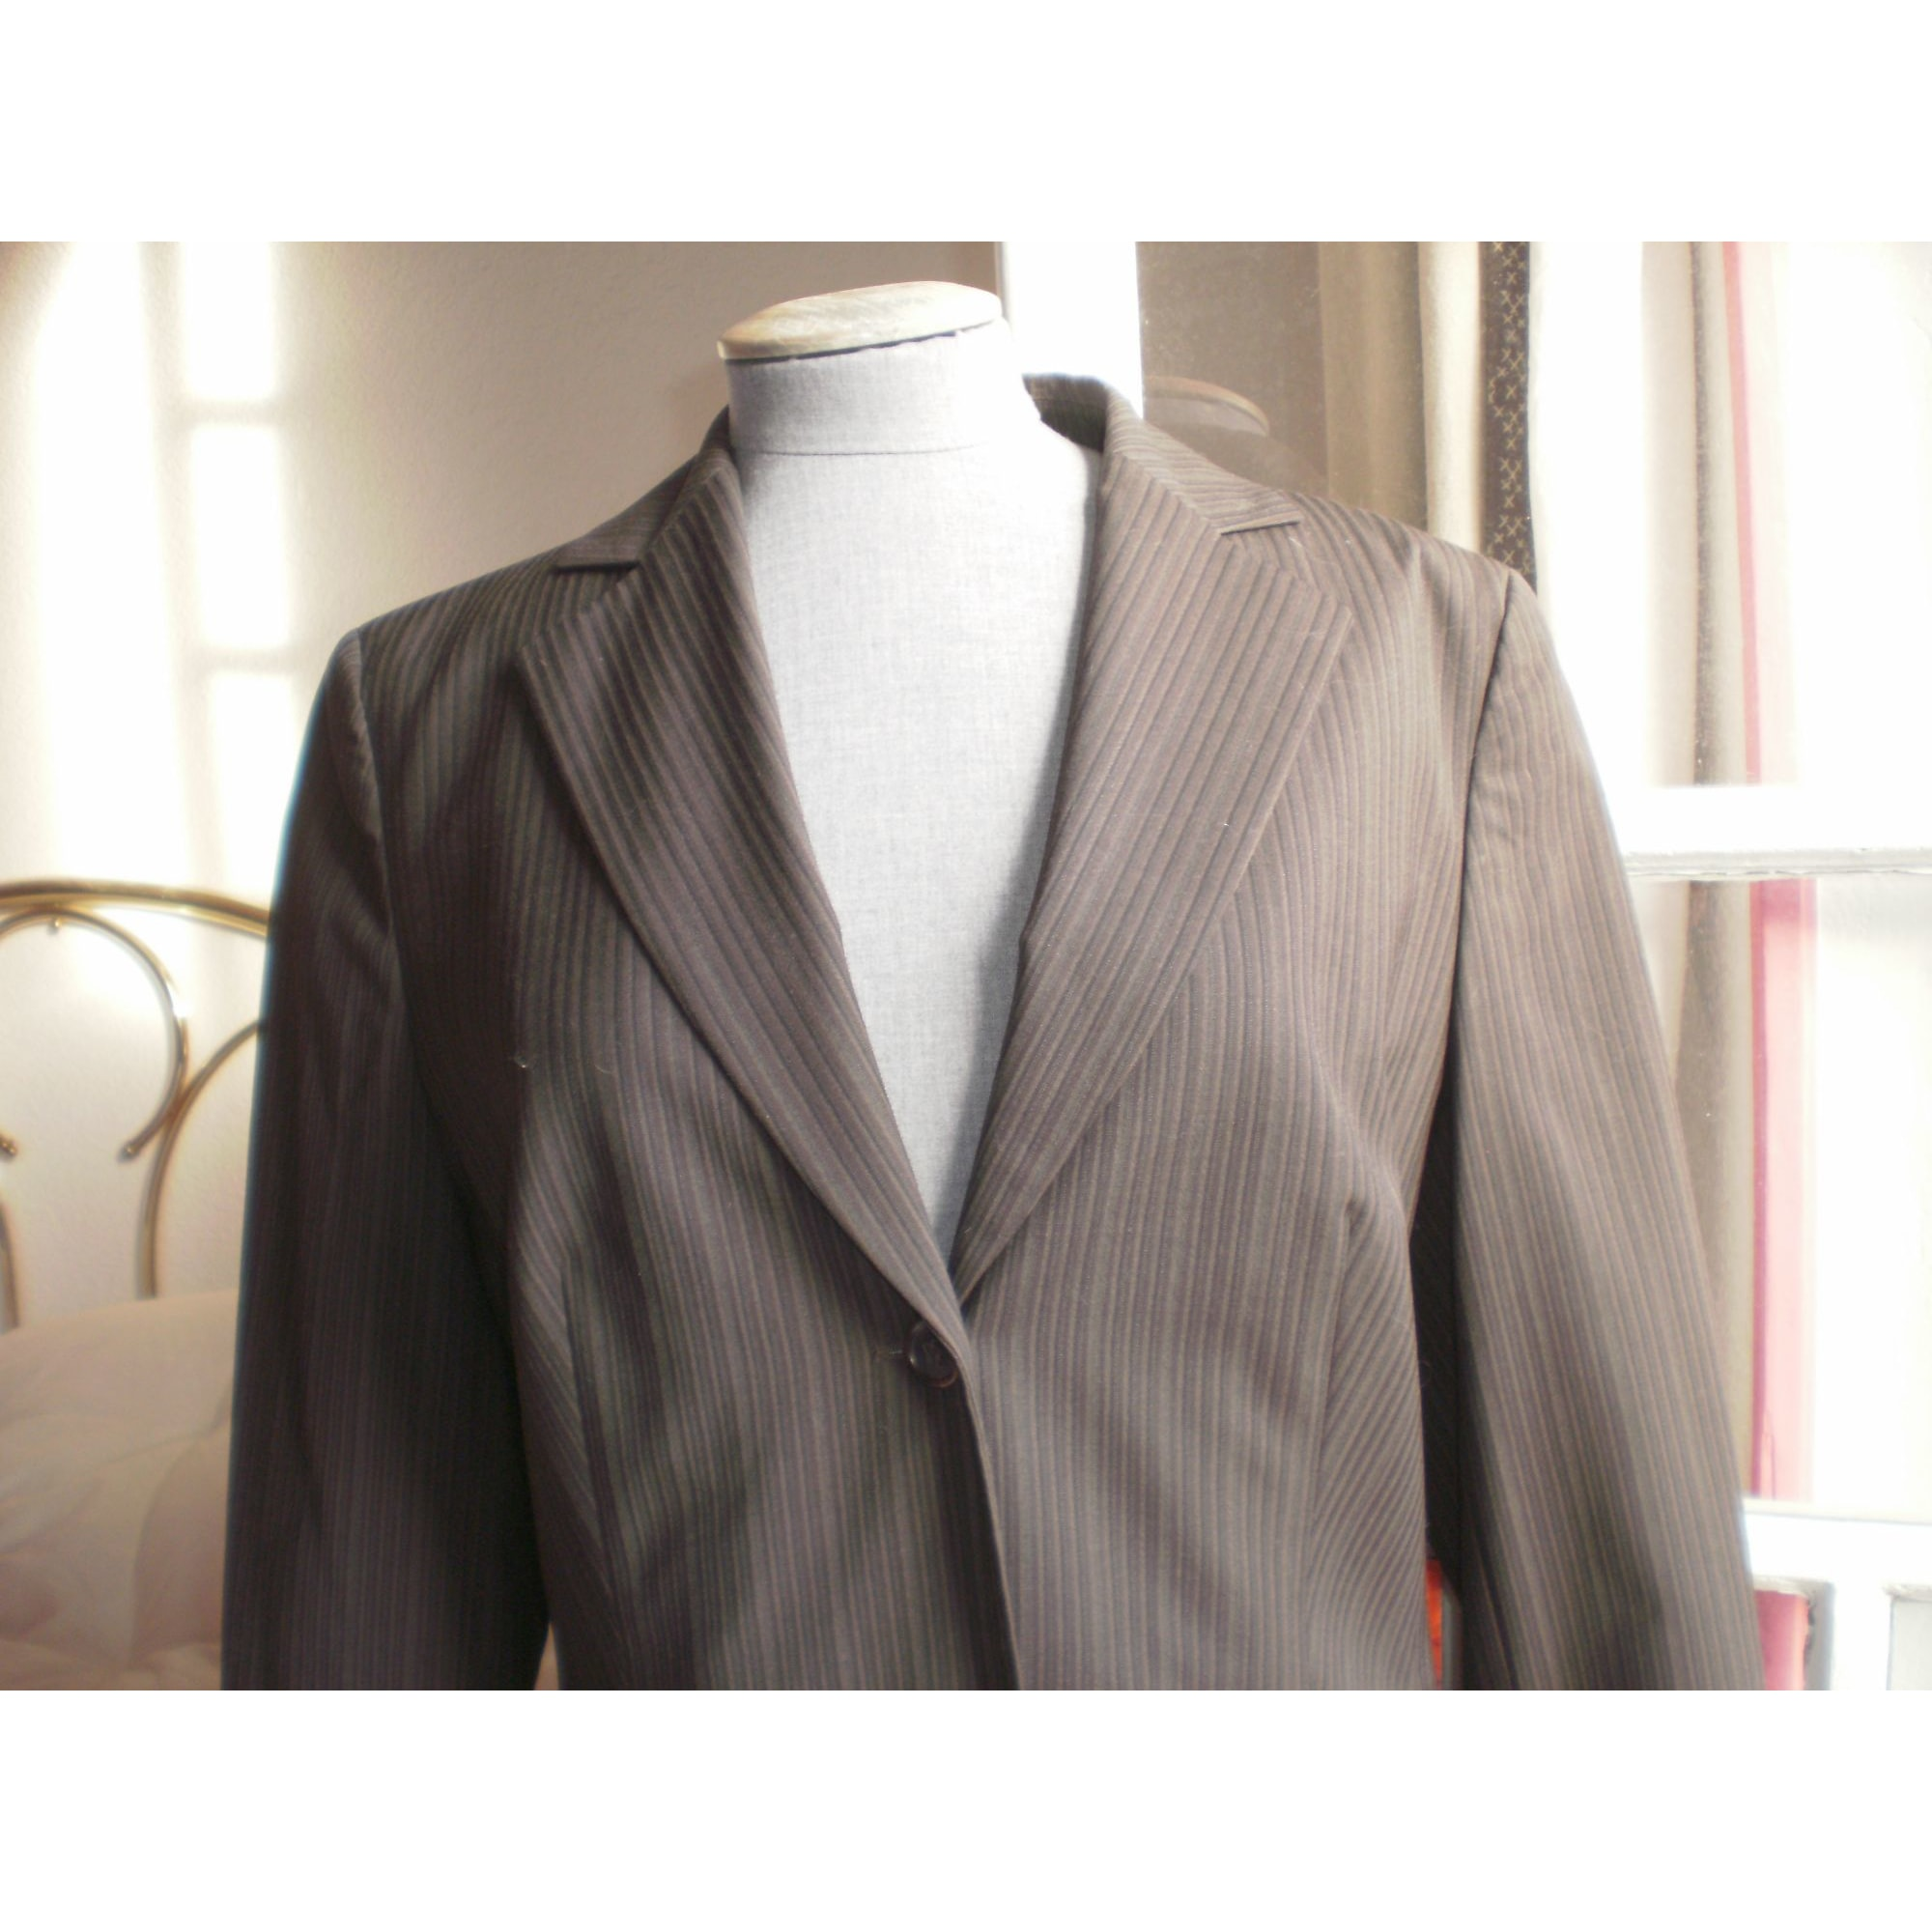 Veste tailleur femme hugo boss